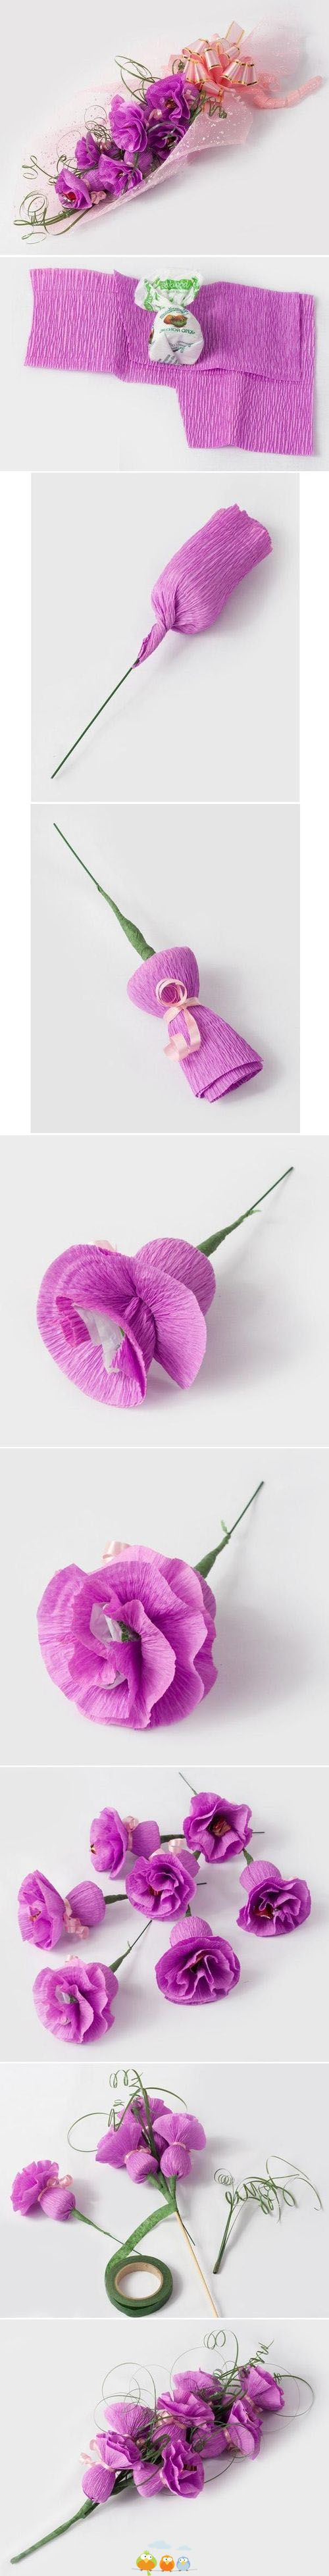 Grafon kağıdıyla çiçek